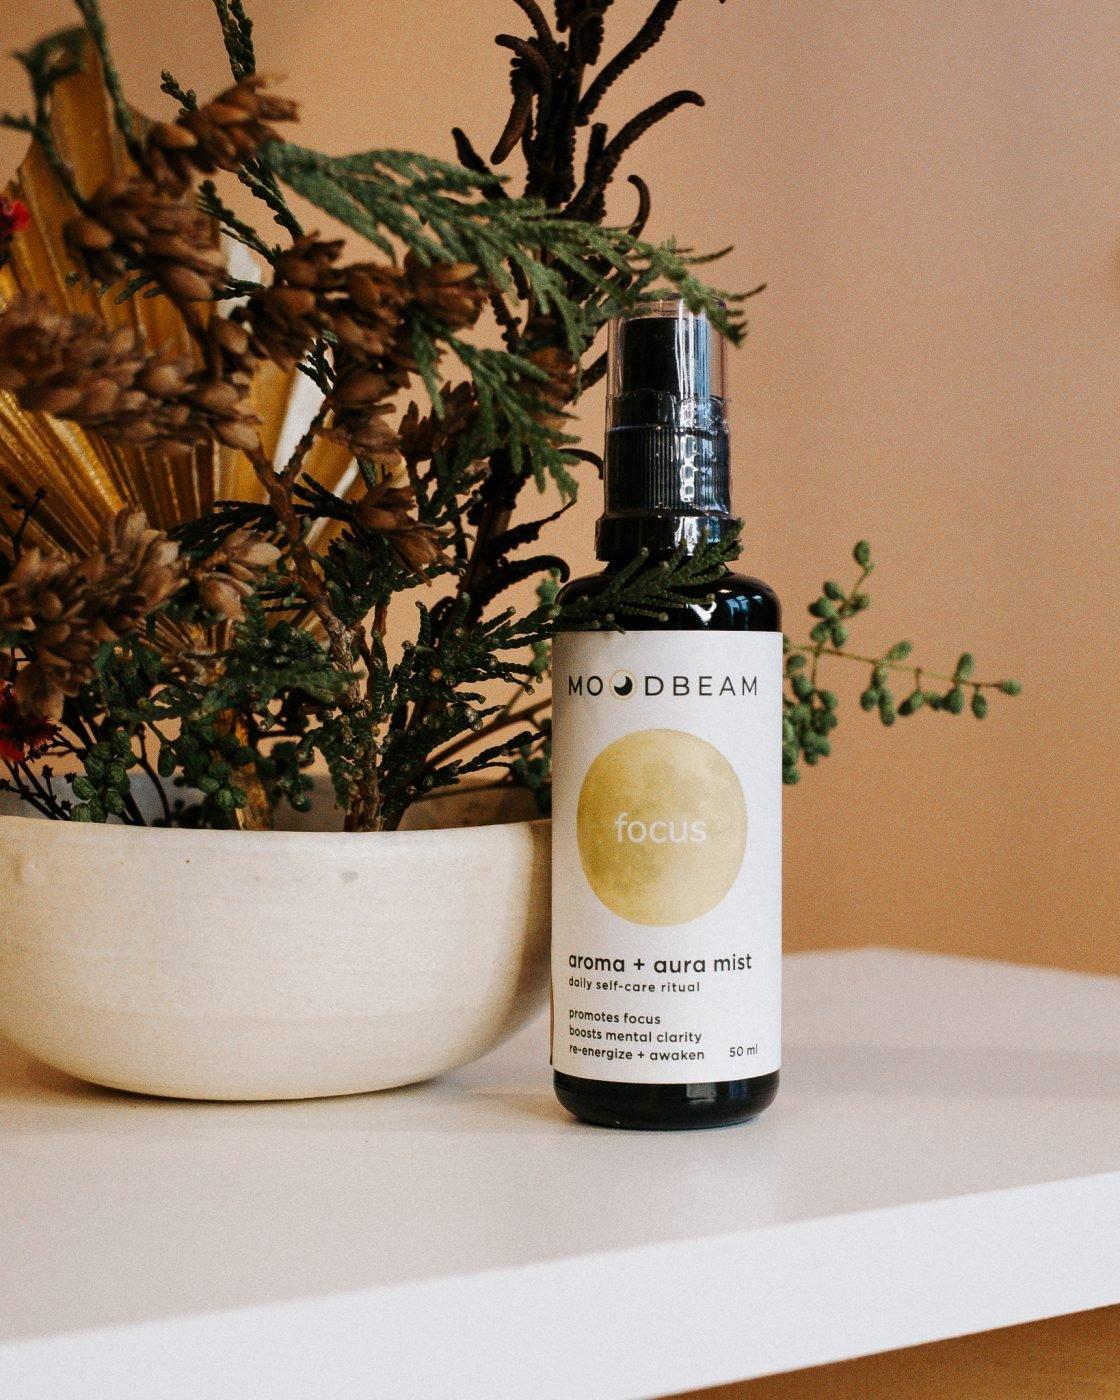 focus spray from moodbeam